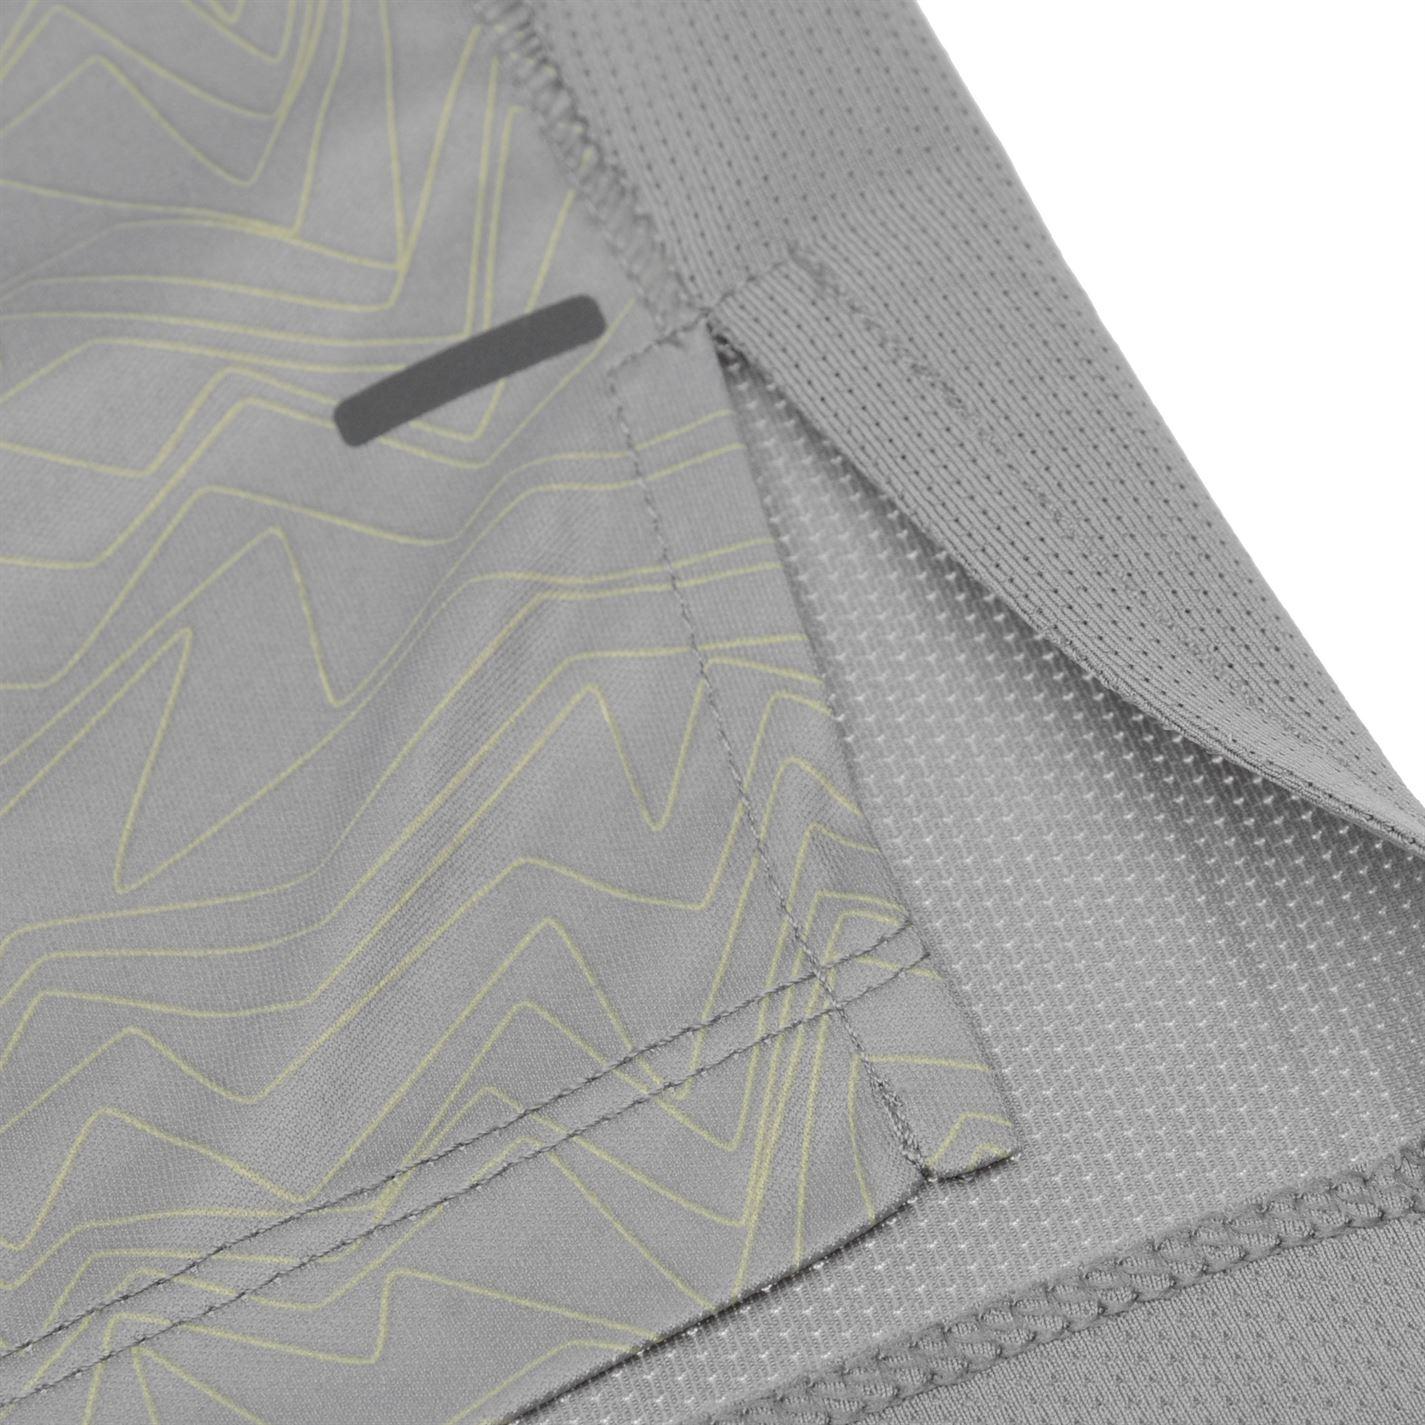 Karrimor-Hombres-X-Lite-Camiseta-mangas-cortas-de-carrera-Rendimiento-Camiseta-Top-Cuello-Redondo miniatura 11